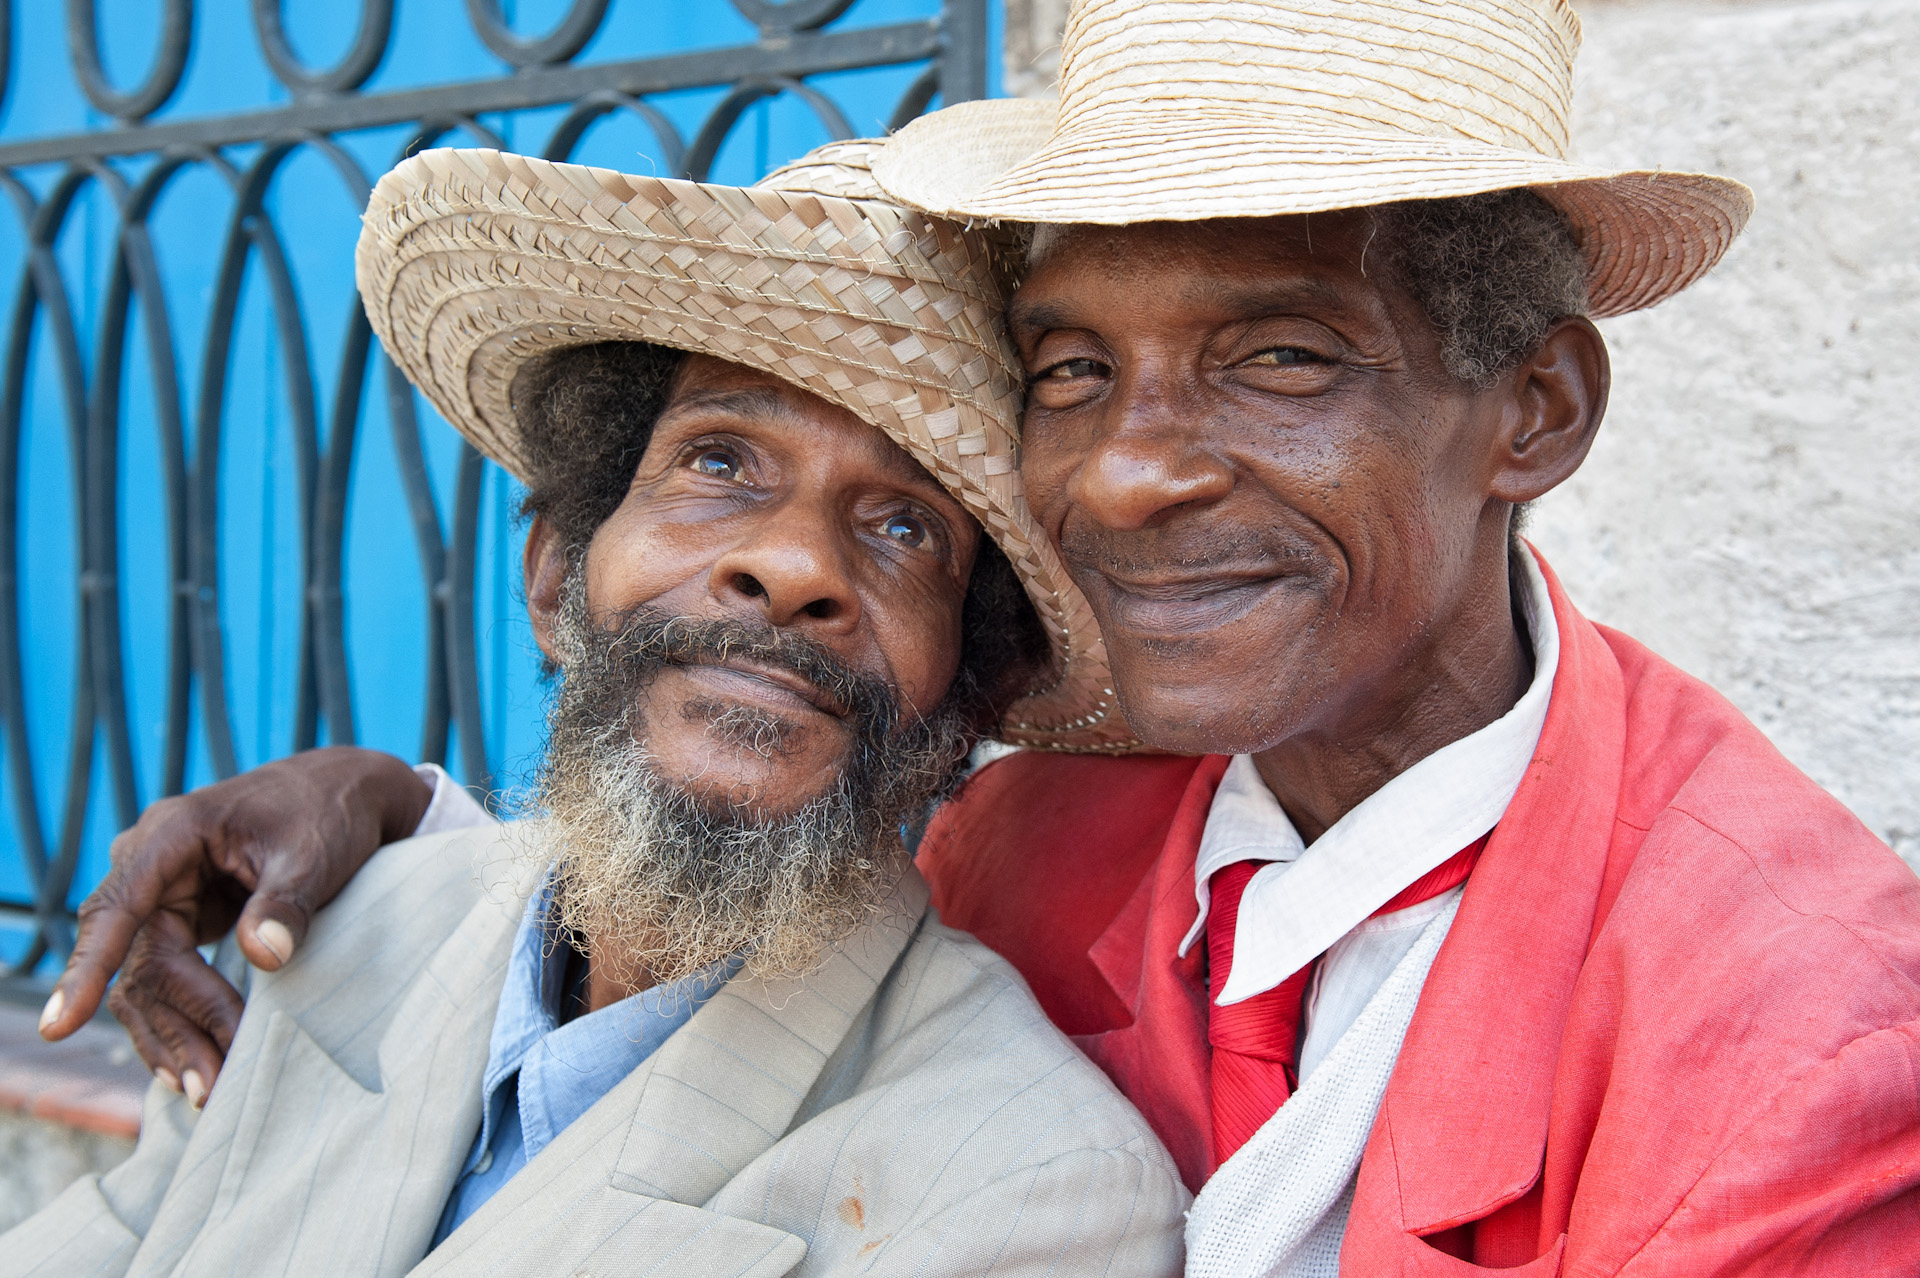 Cuba-Havana-Travel-Portrait-Jason-Bax.JPG